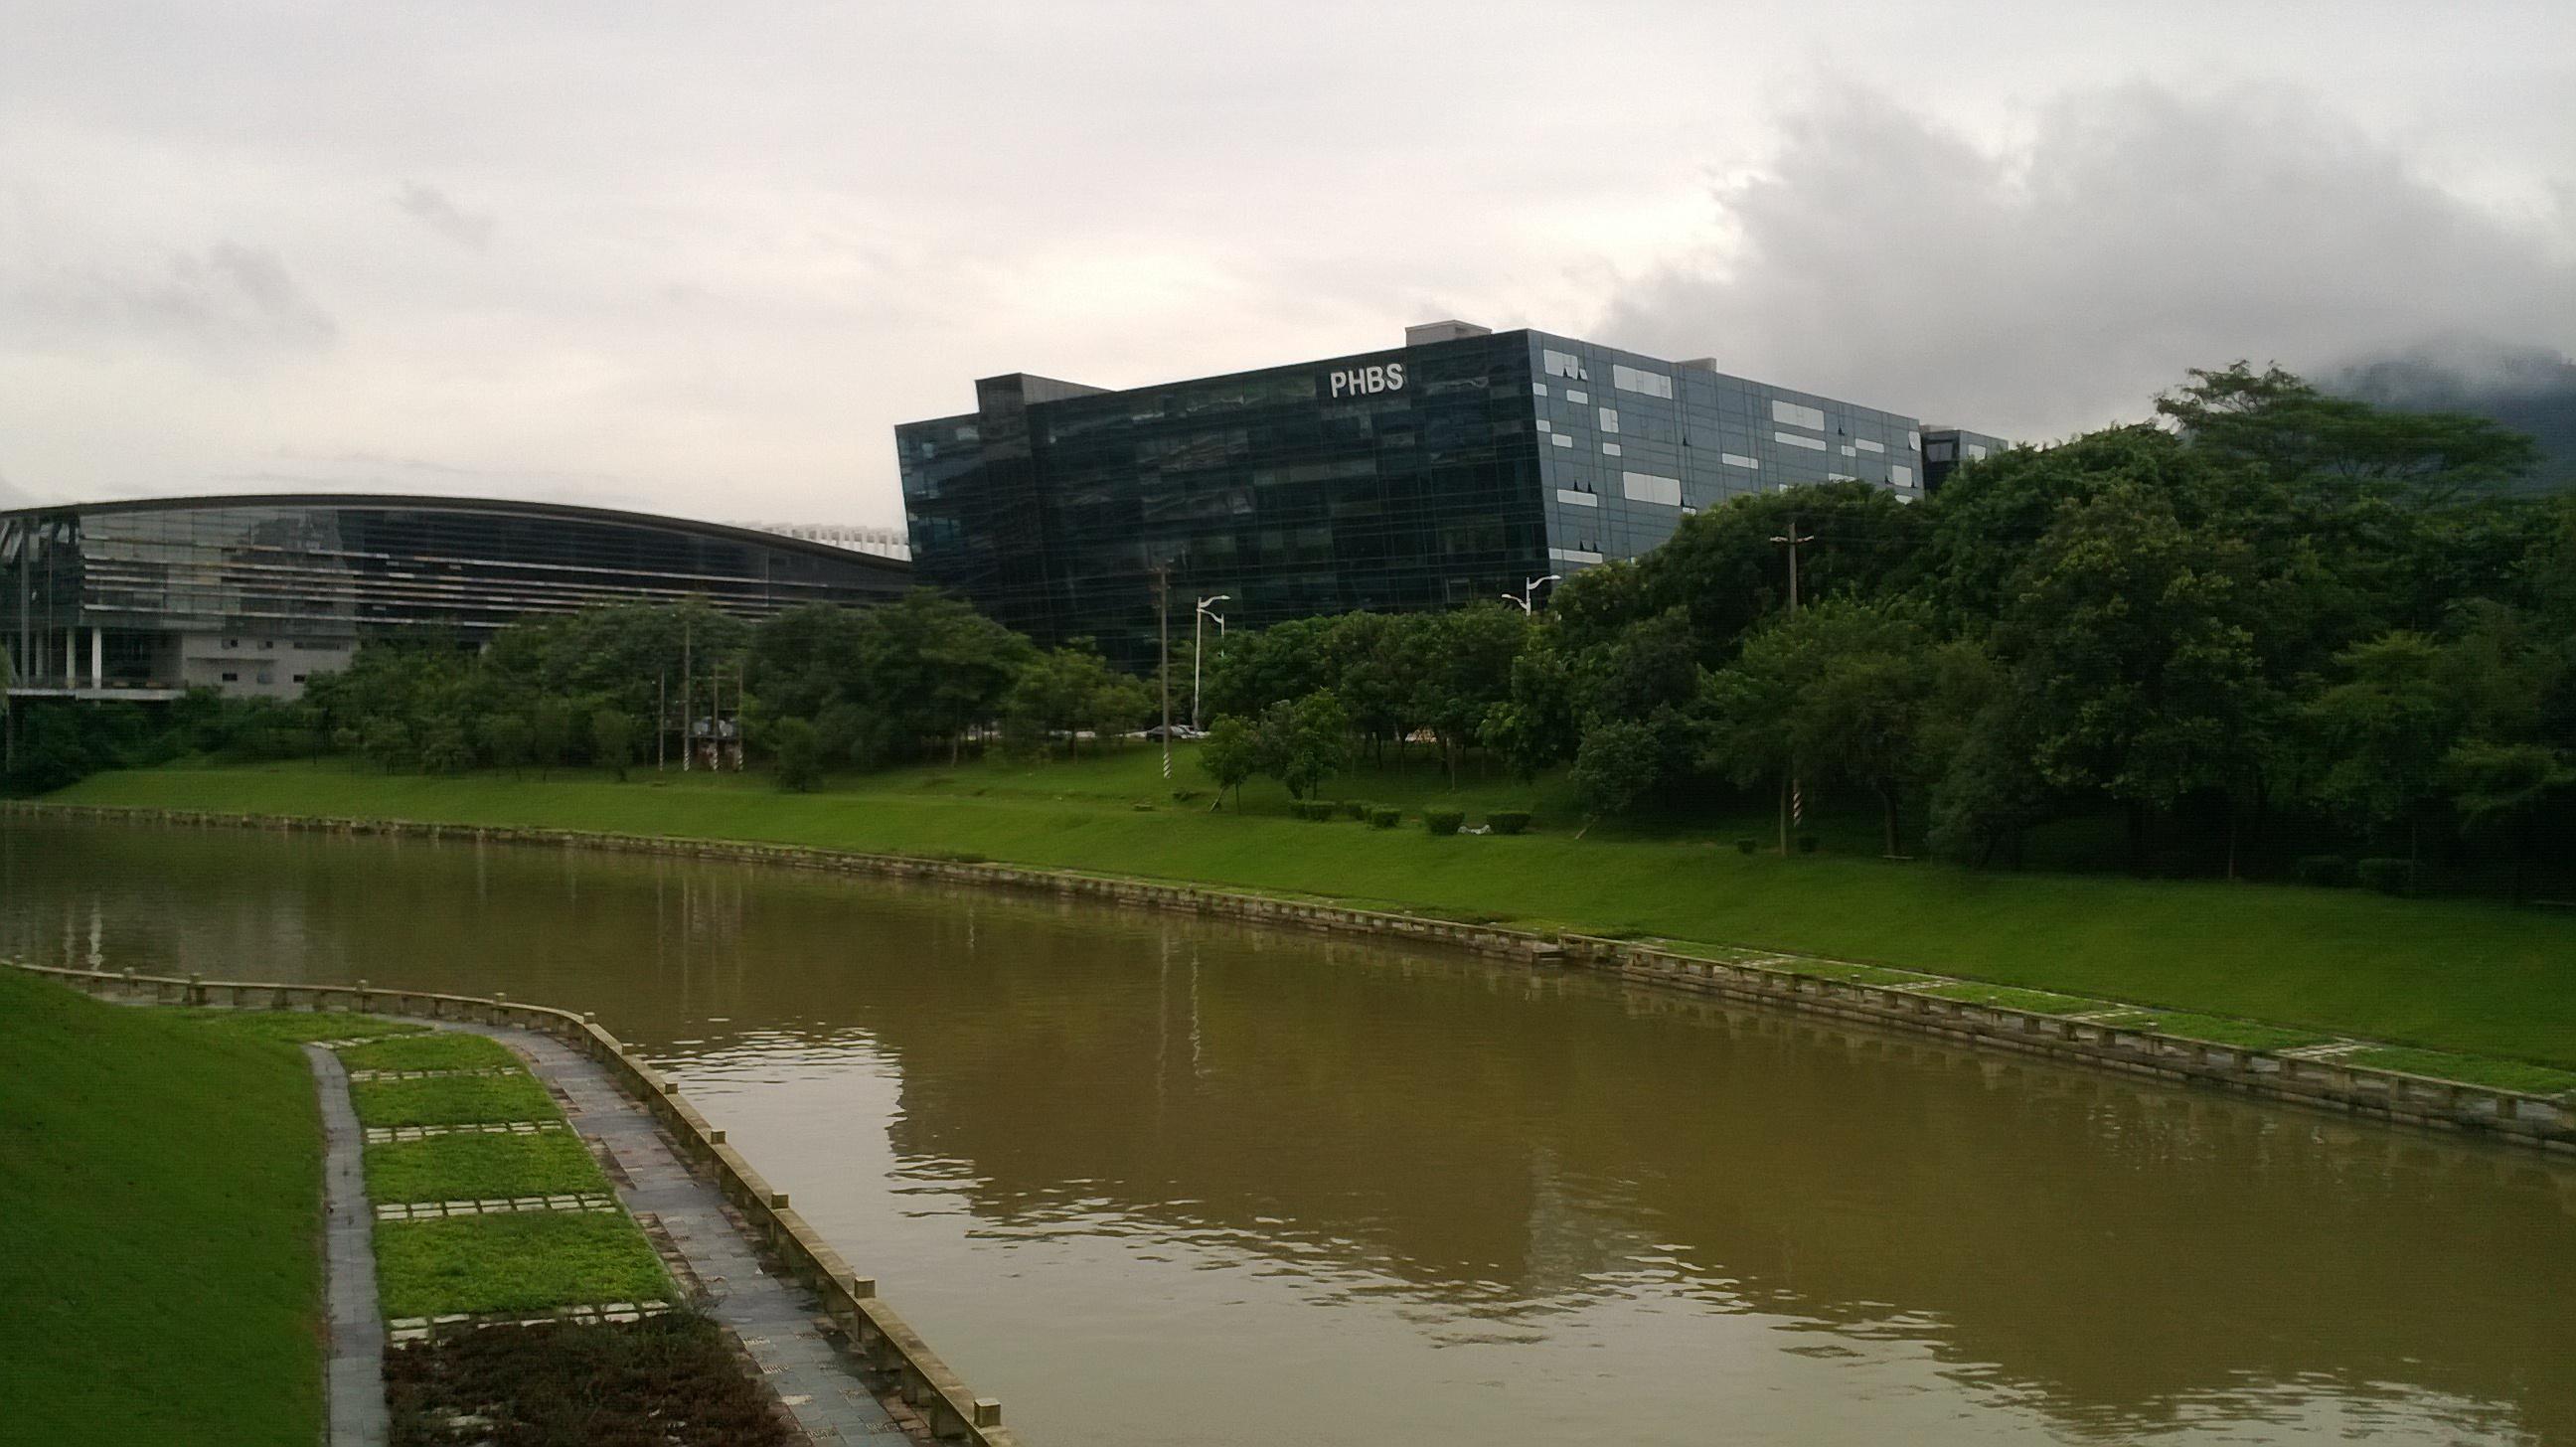 File:HSBC Business School jpg - Wikimedia Commons